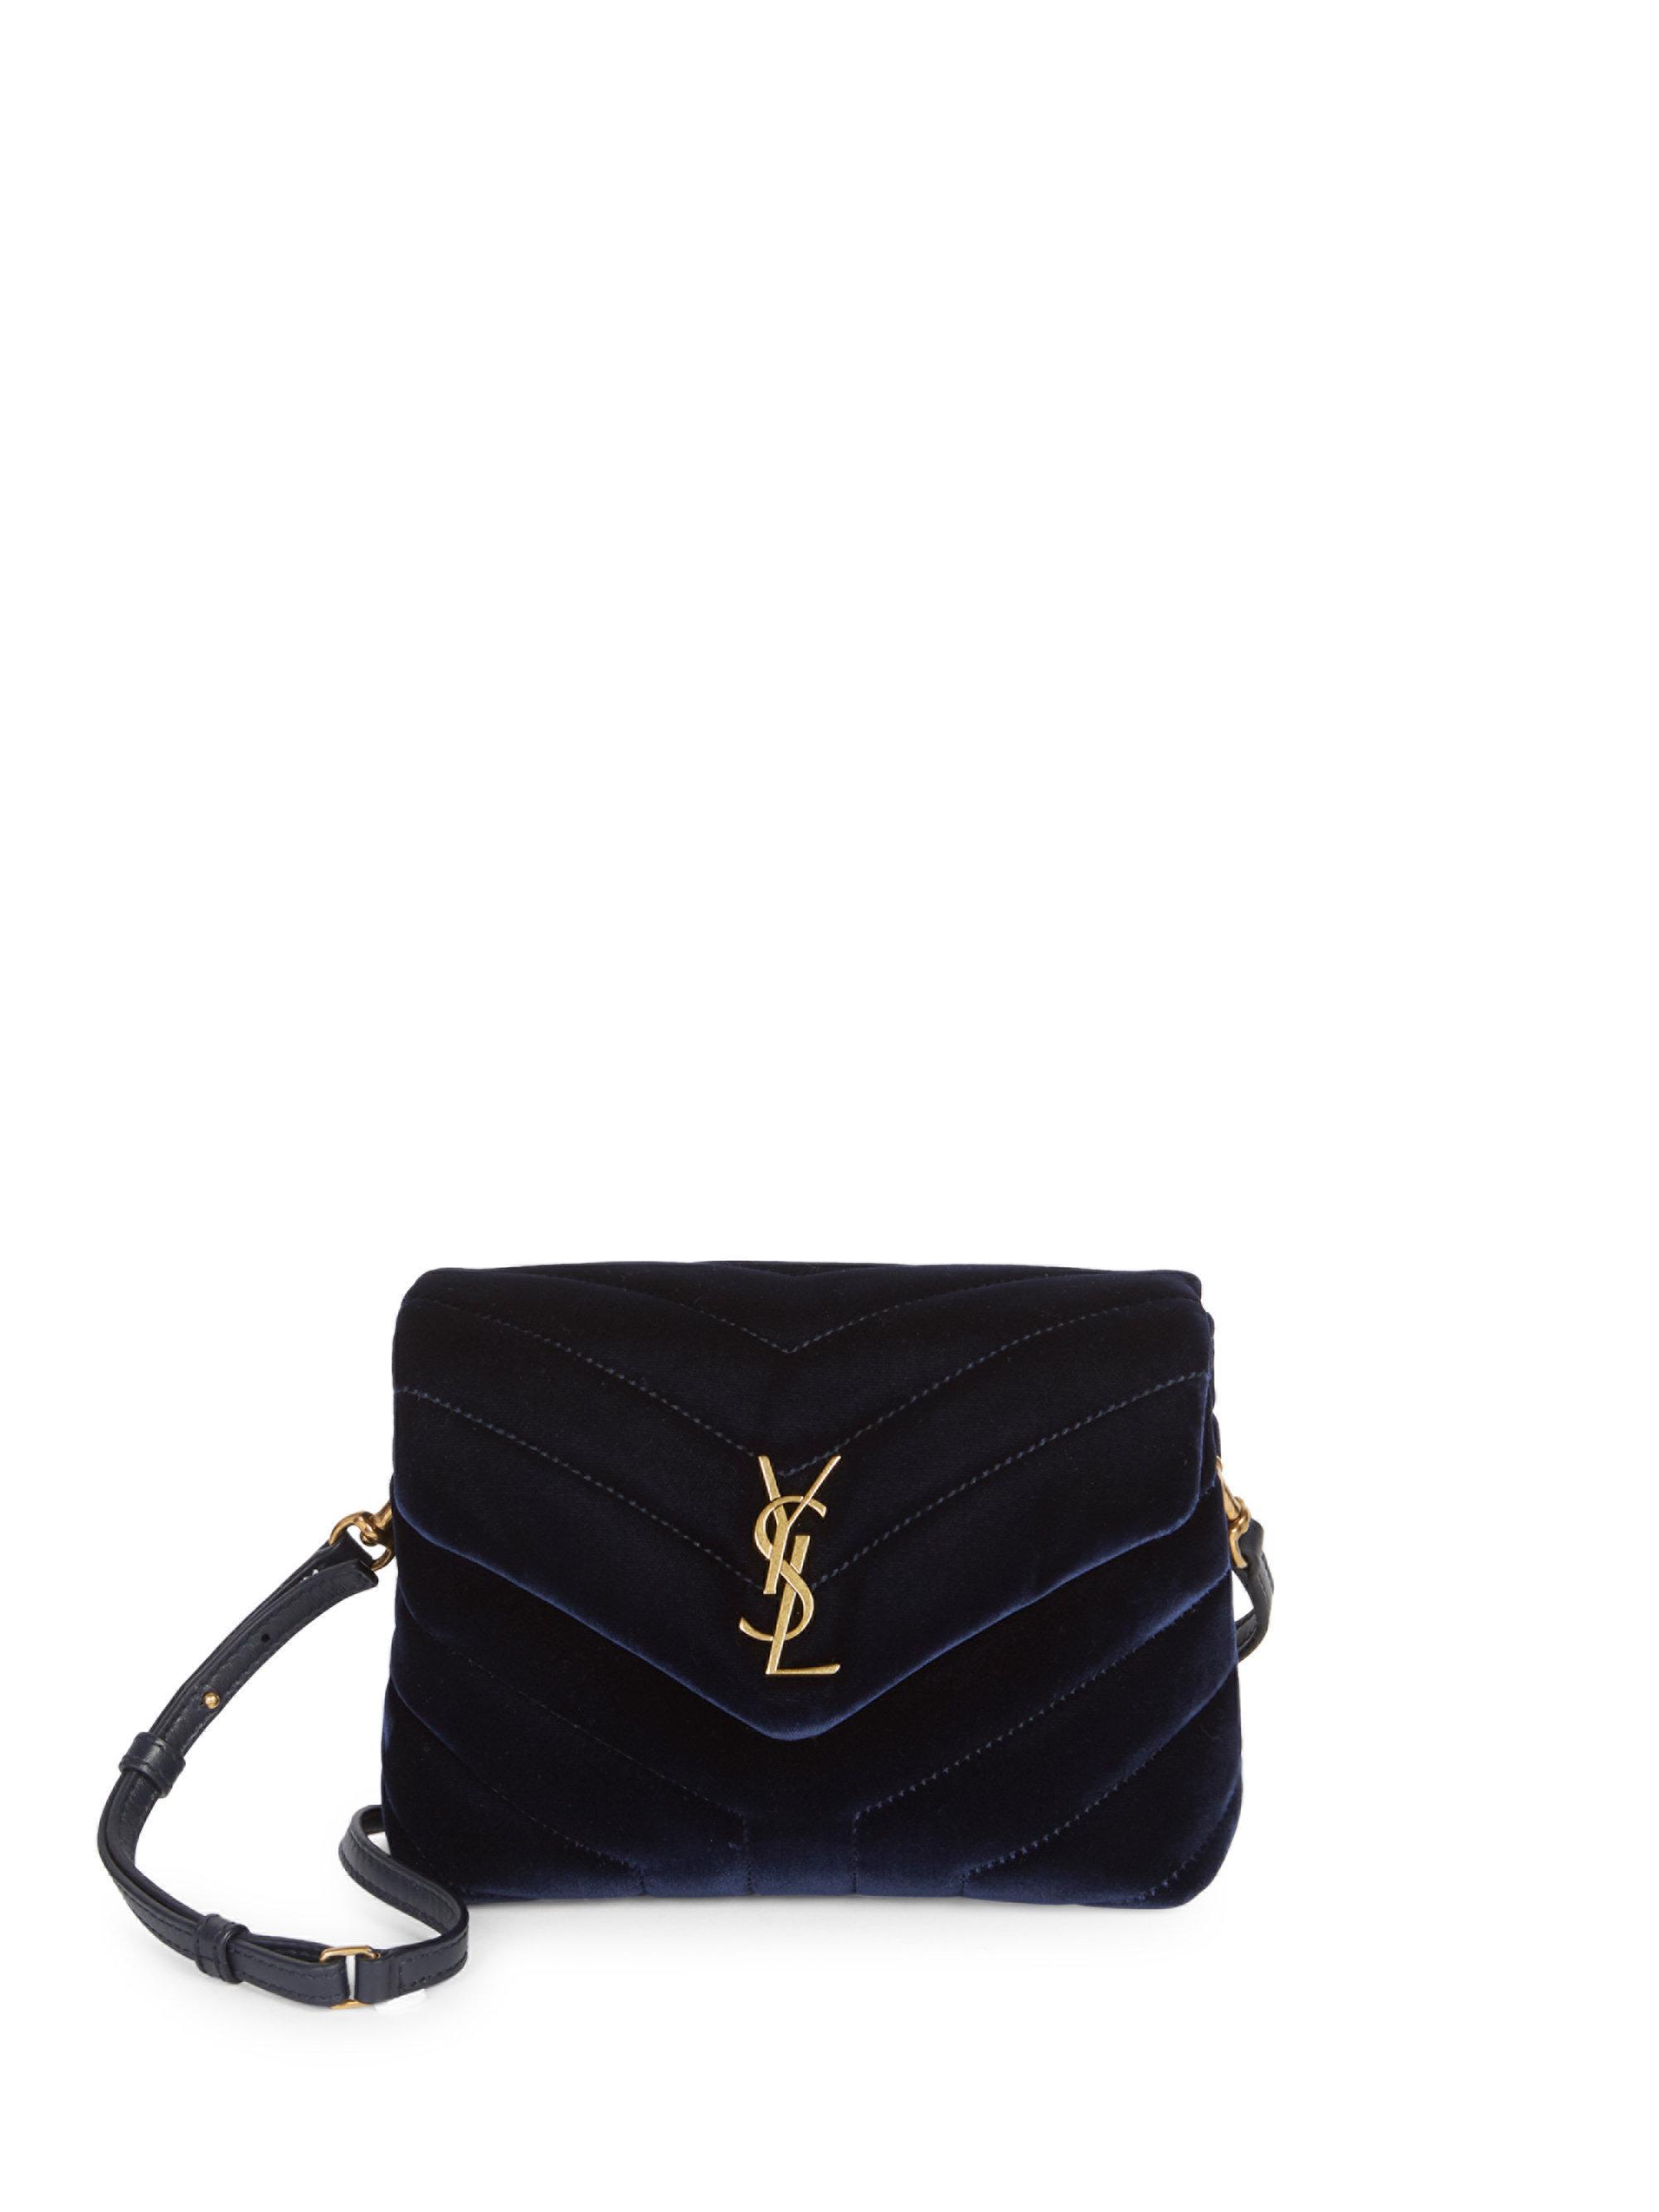 118a732ac114 Saint Laurent Toy Loulou Velvet Crossbody Bag in Black - Lyst